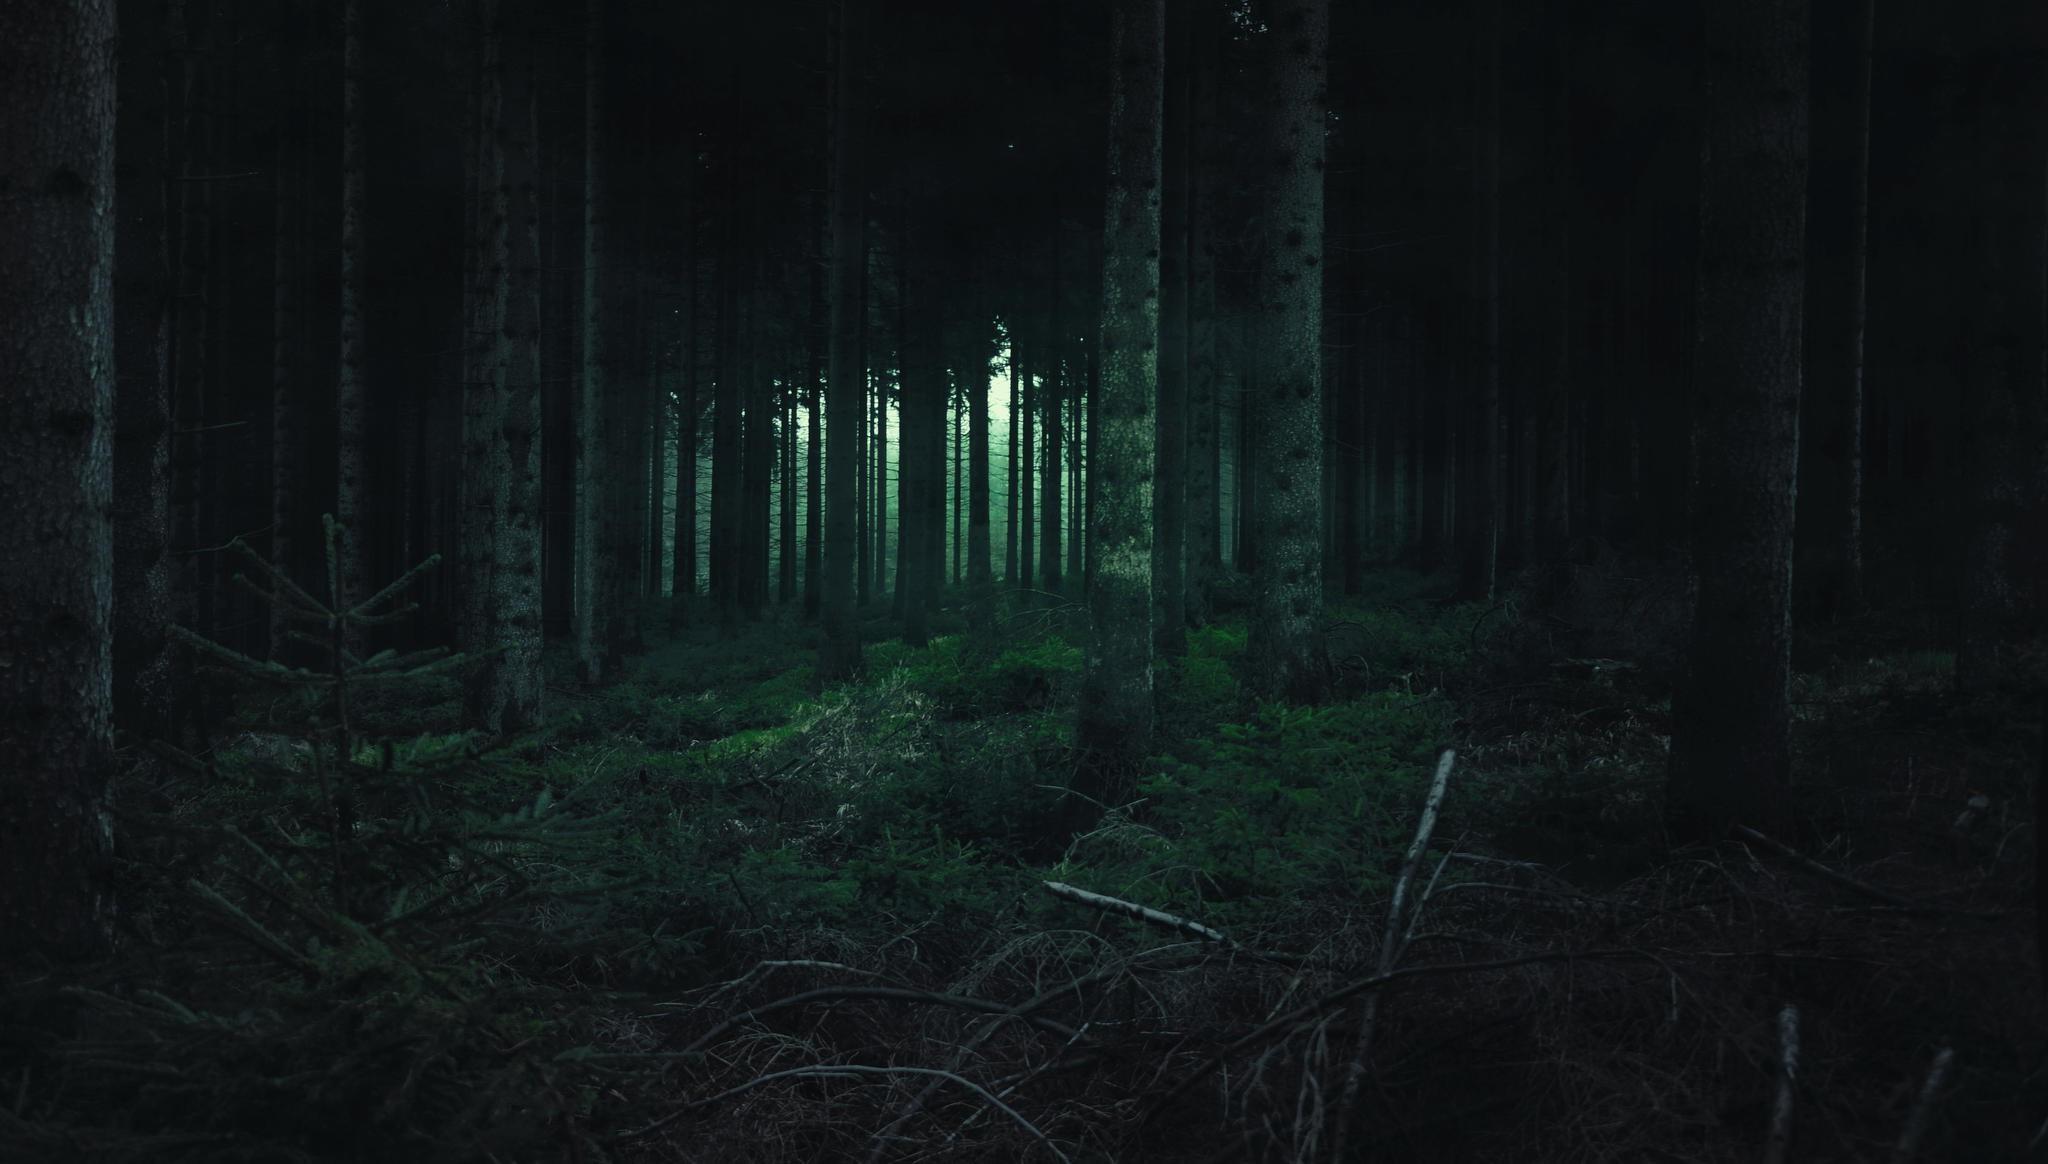 Wallpaper Landscape Night Nature Grass Atmosphere